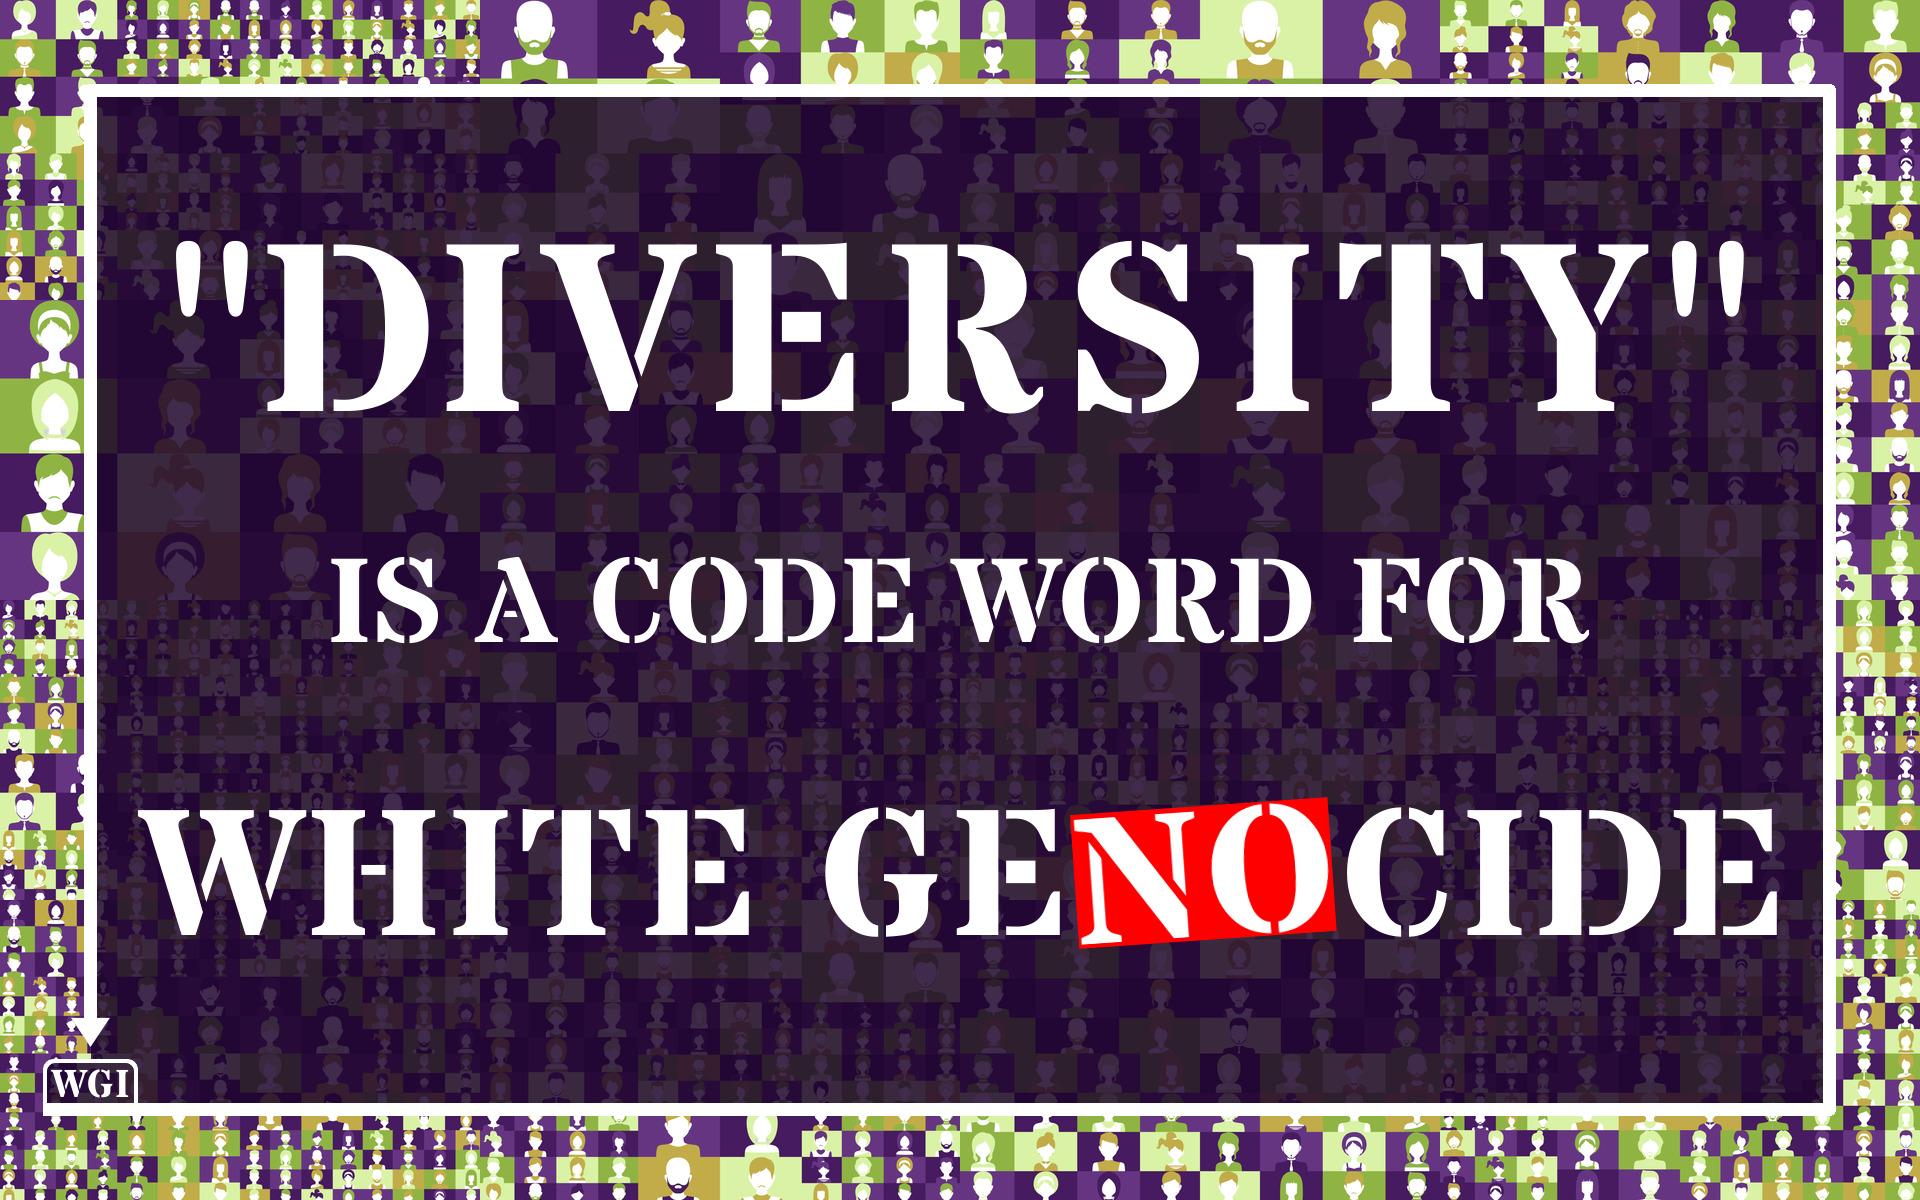 whitegenocide_image